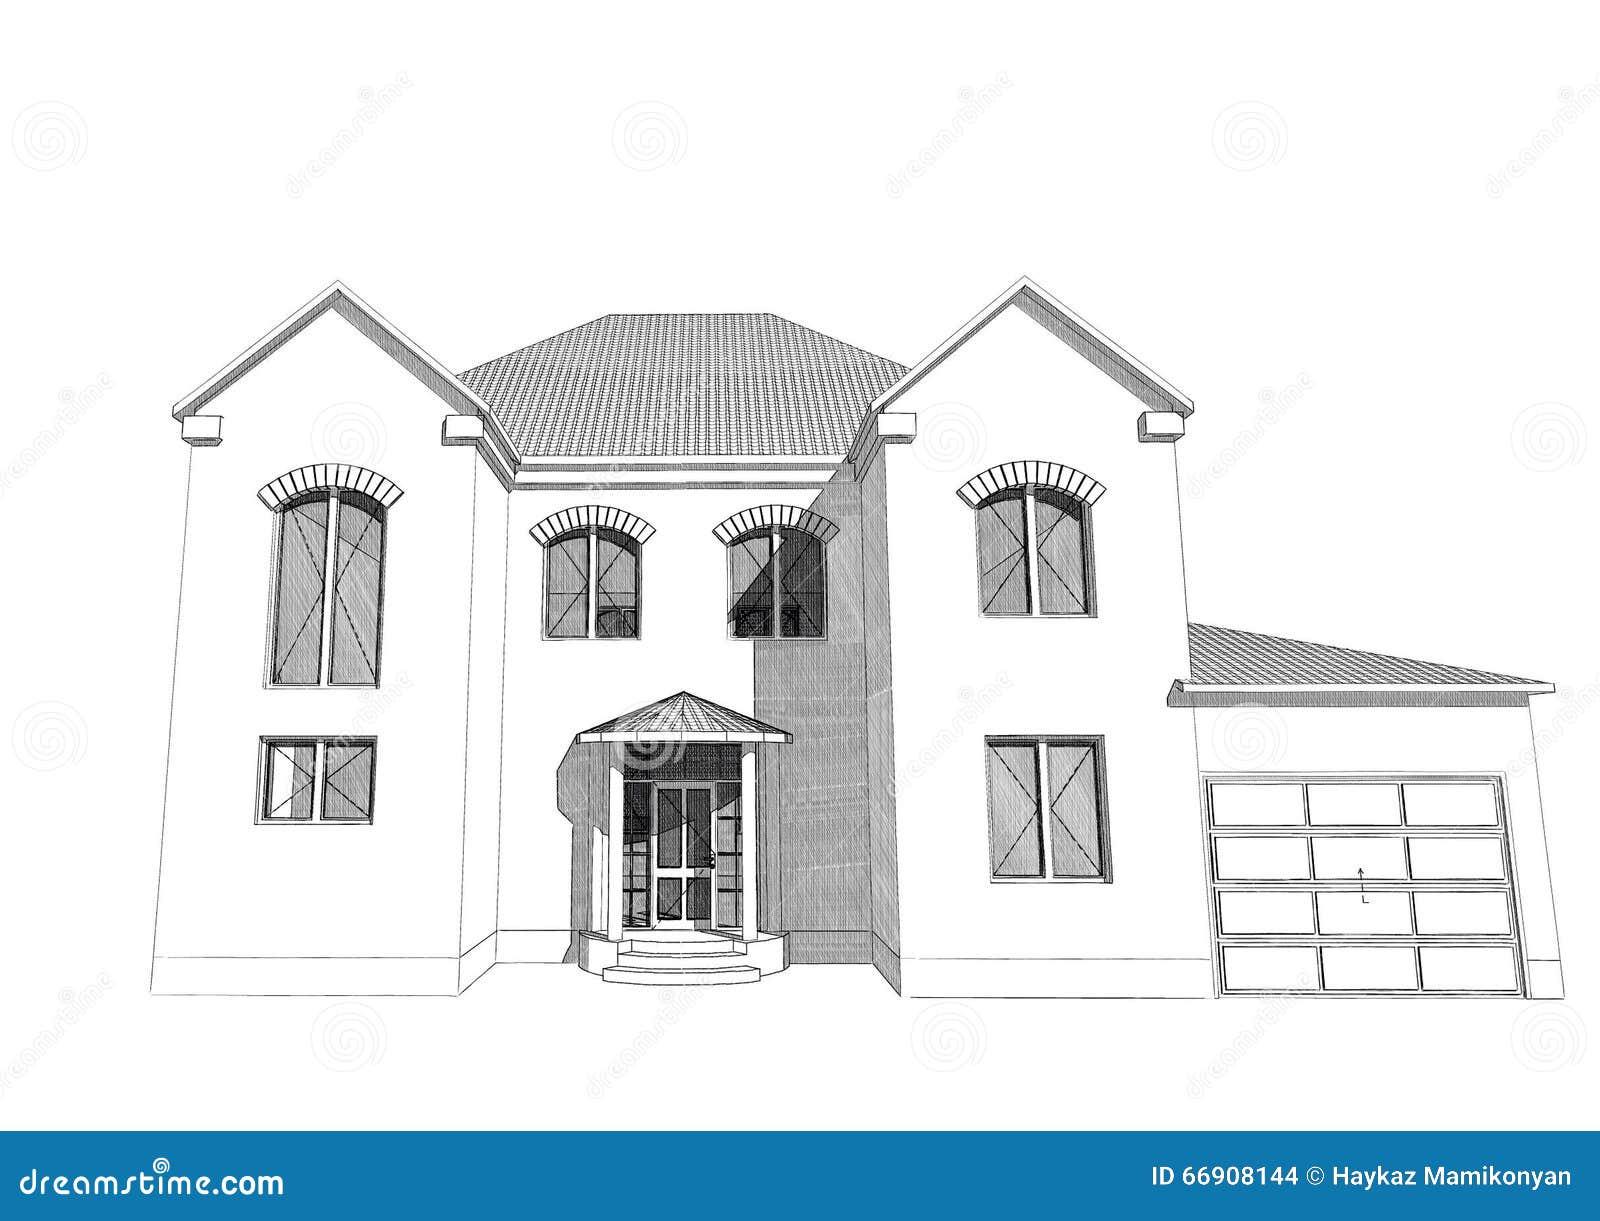 Maison r sidentielle 3d illustration stock image 66908144 for Programme dessin maison